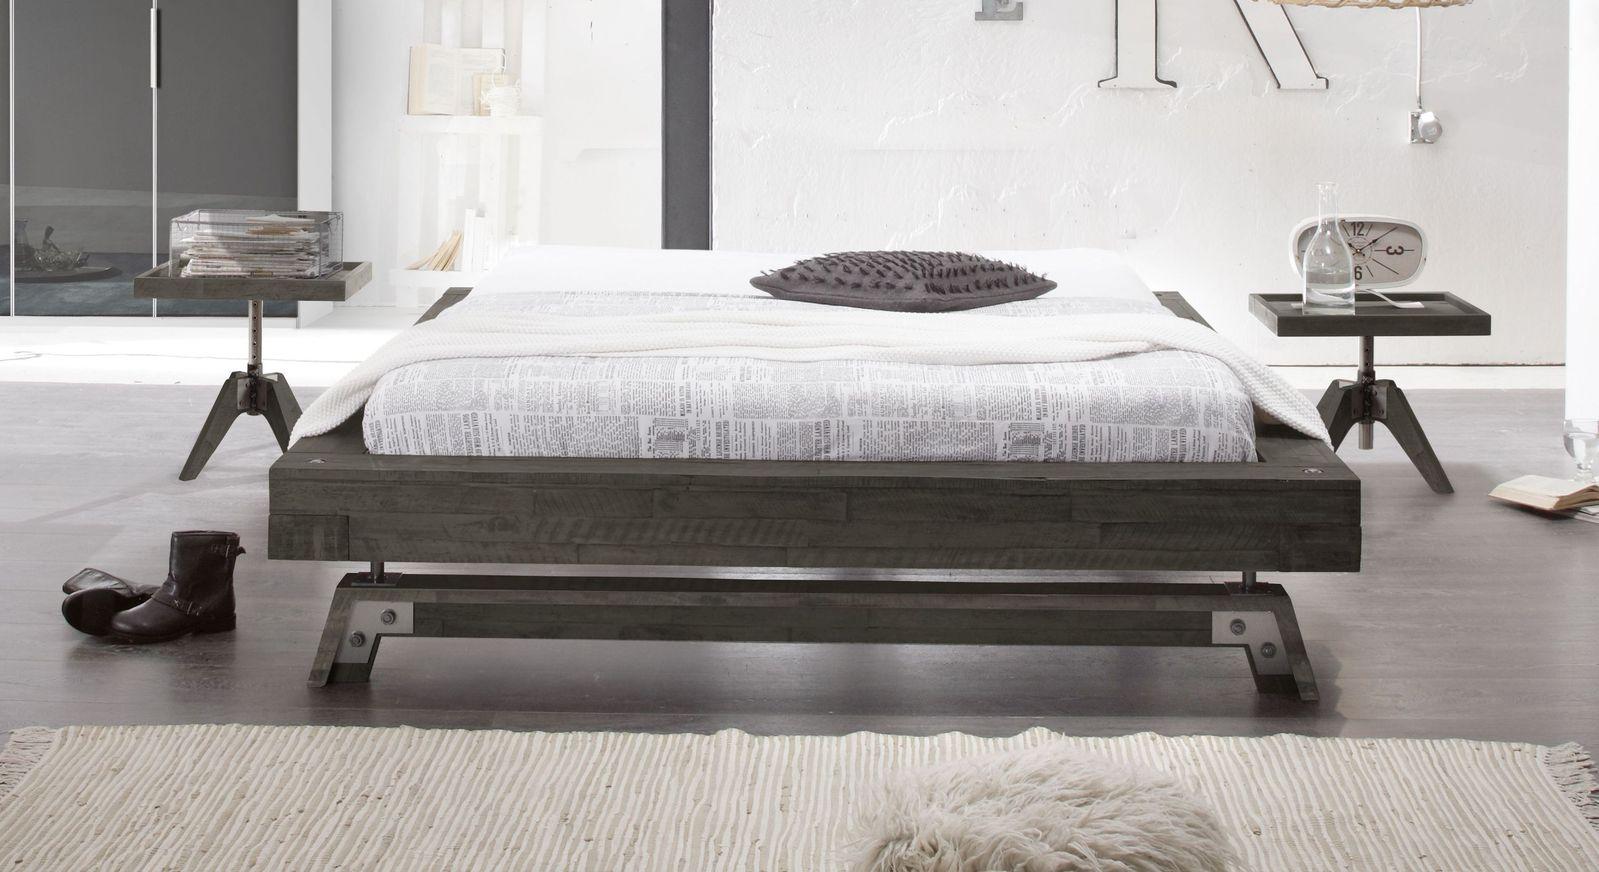 echtholz liege aus akazienholz im industrial style molina. Black Bedroom Furniture Sets. Home Design Ideas